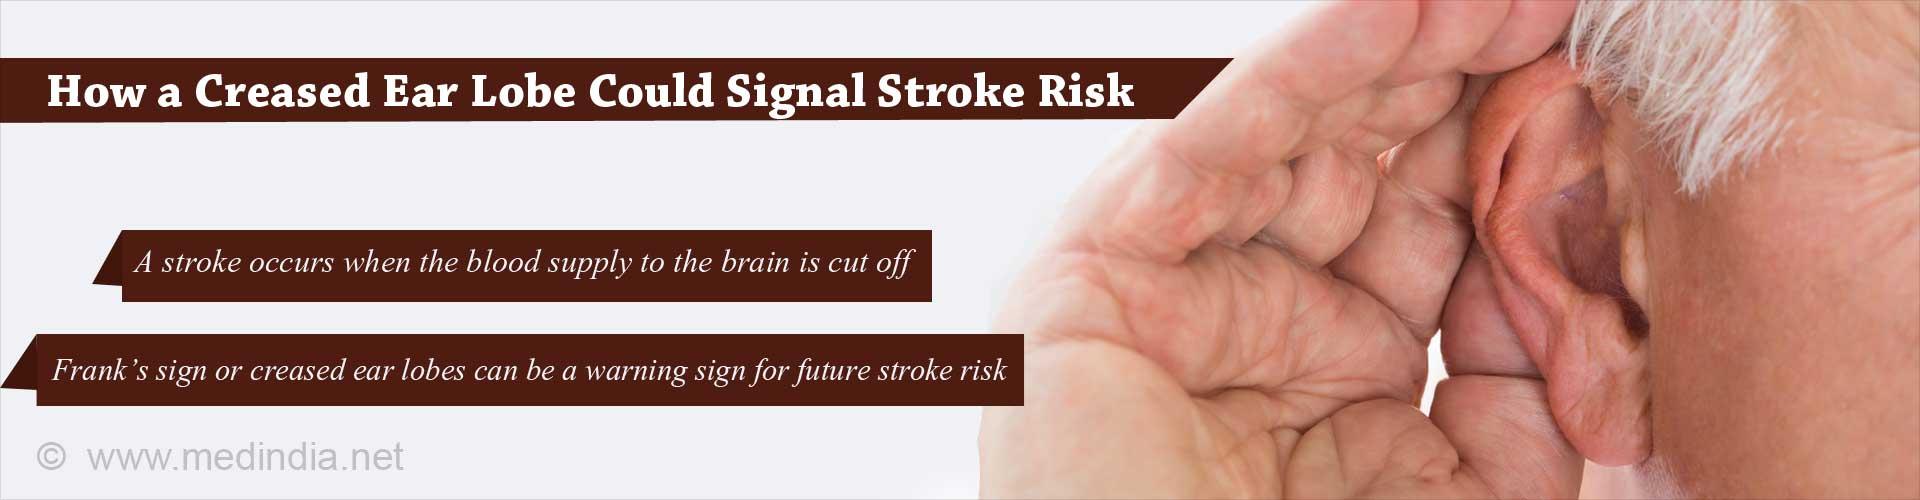 Can a Creased Ear Lobe Predict the Risk of Stroke